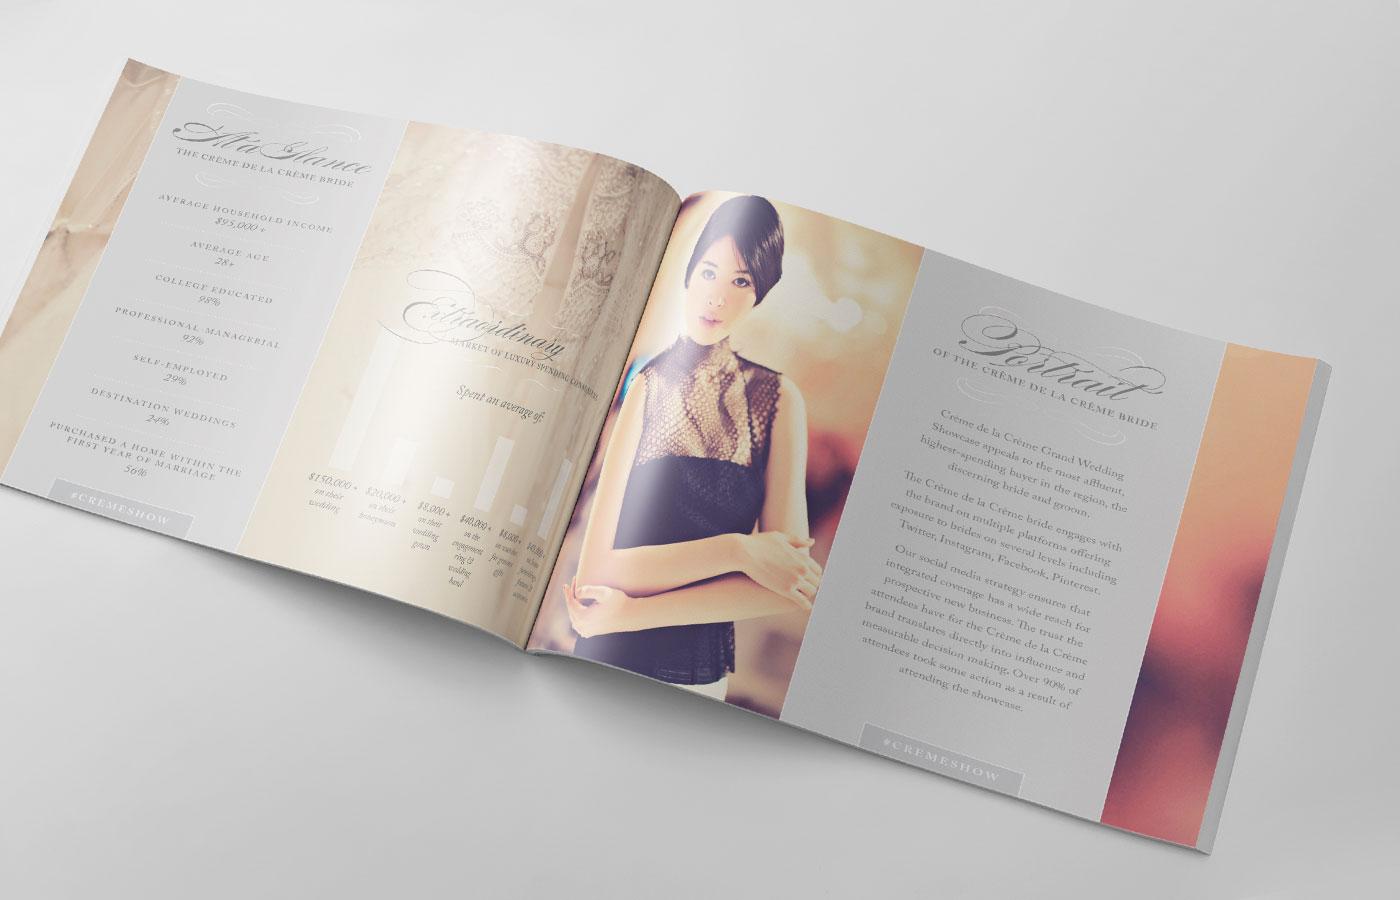 covetdesign_logo-design_branding_package-design_graphic-designer_vancouver_work_wide_countdown-6